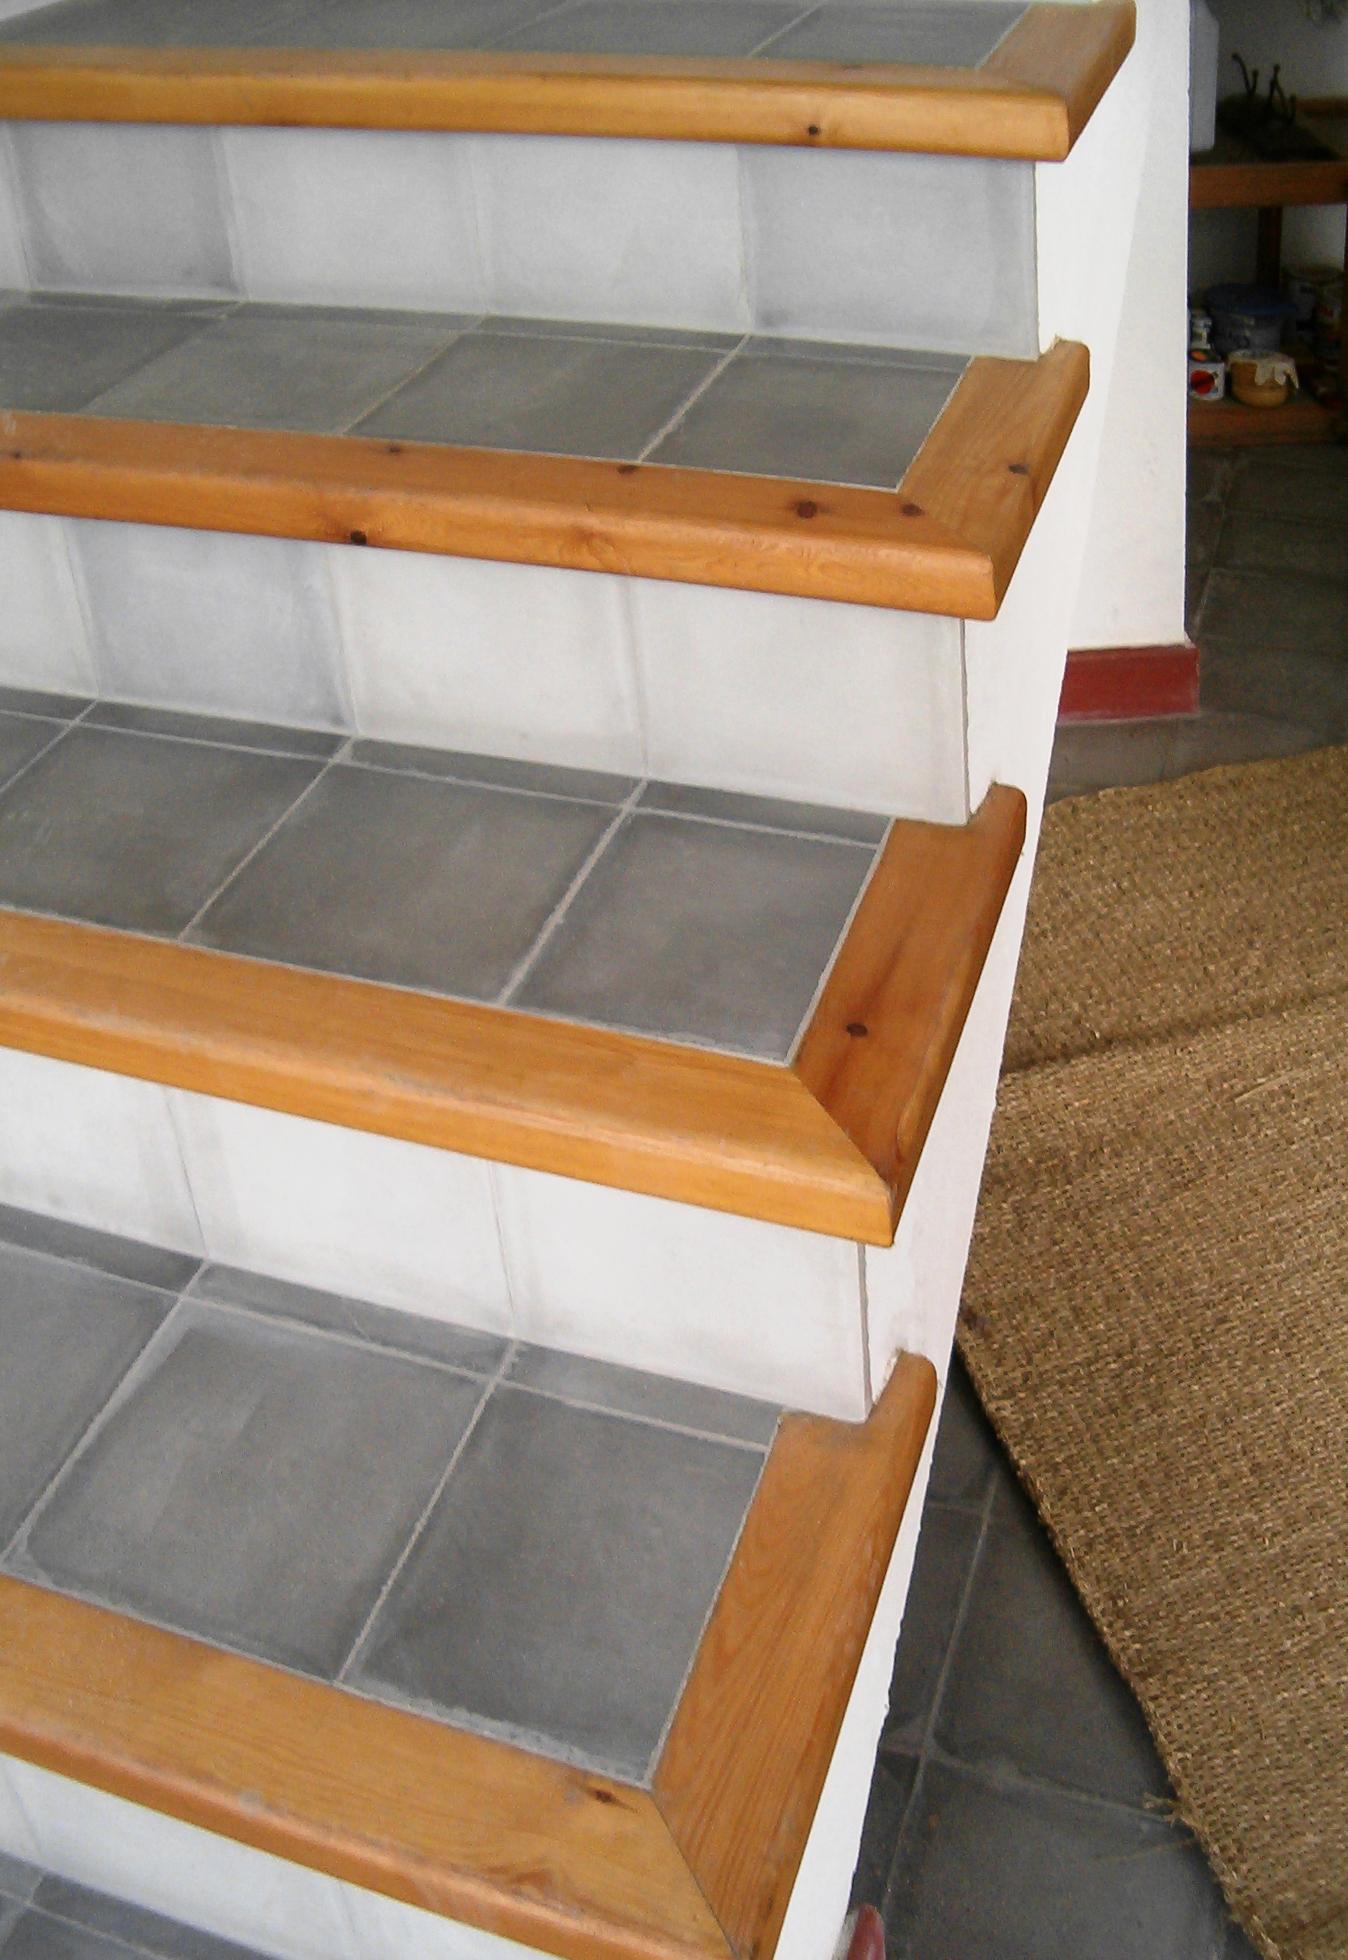 Innendekotationen - Flur Wohnzimmer - Zementfliesen